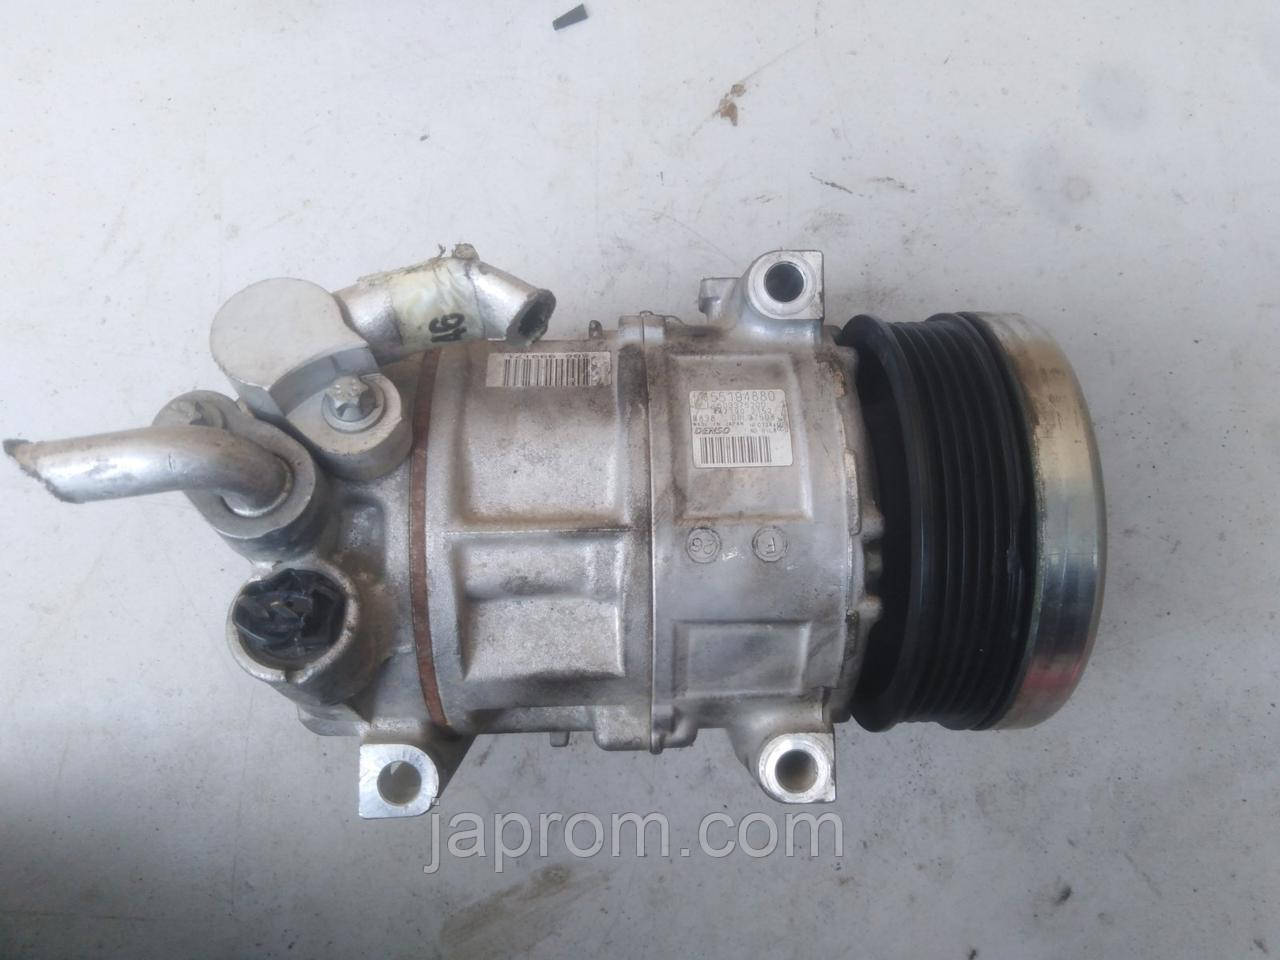 Компрессор кондиционера Fiat Doblo II Punto Linea Qubo Fiorino 1.4 бензин 08-15г.в дефект